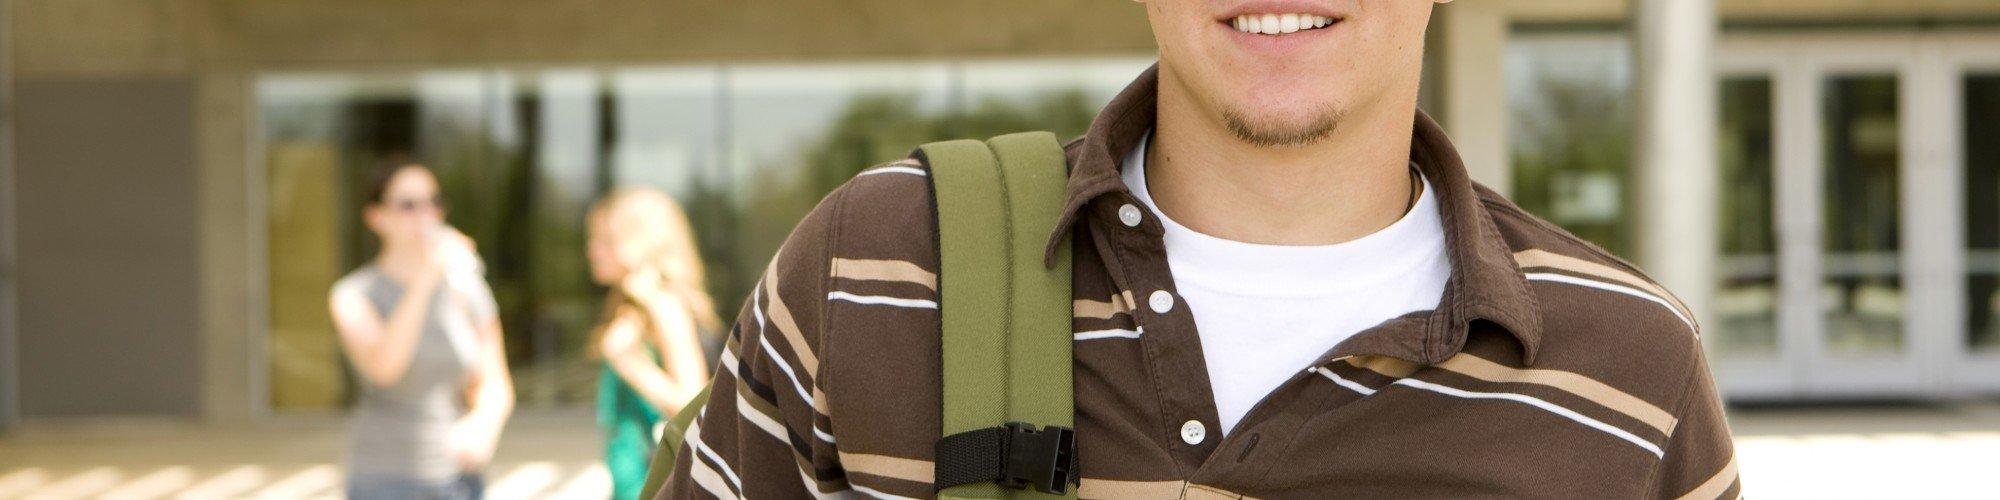 Navigating the Precarious World of College Applications | ShoreBread